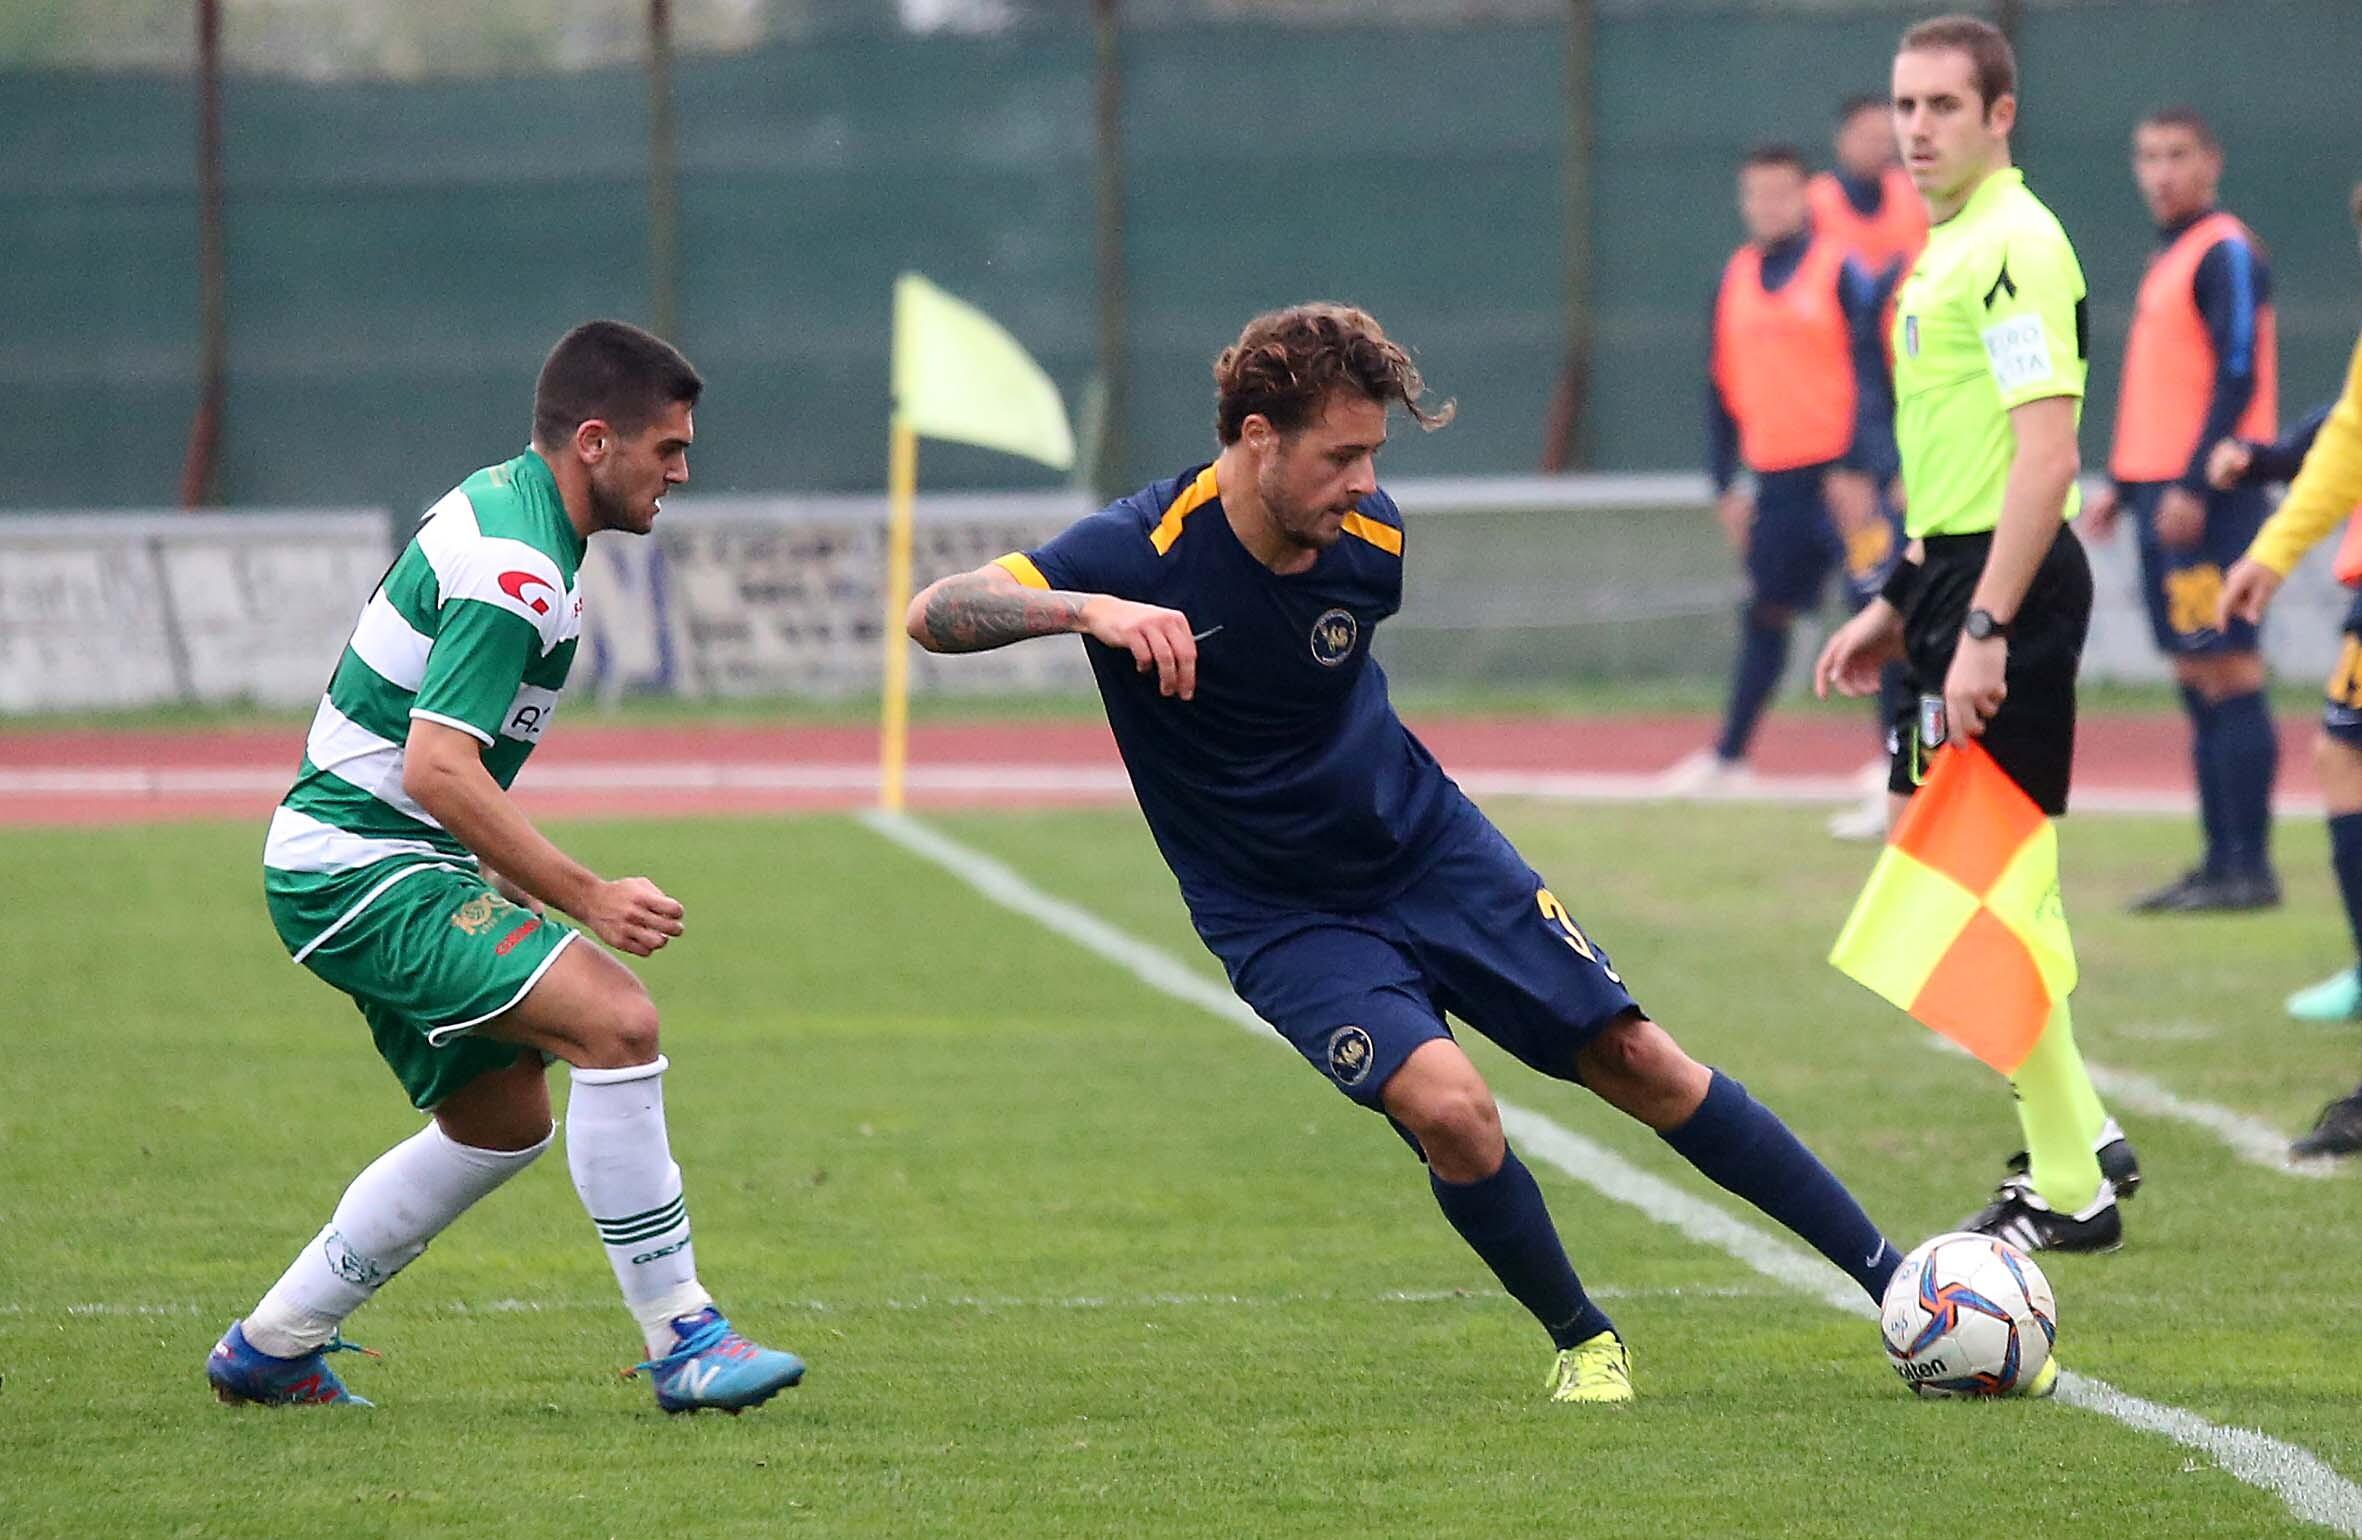 Calcio serie D, Santarcangelo retrocesso, San Marino salvo